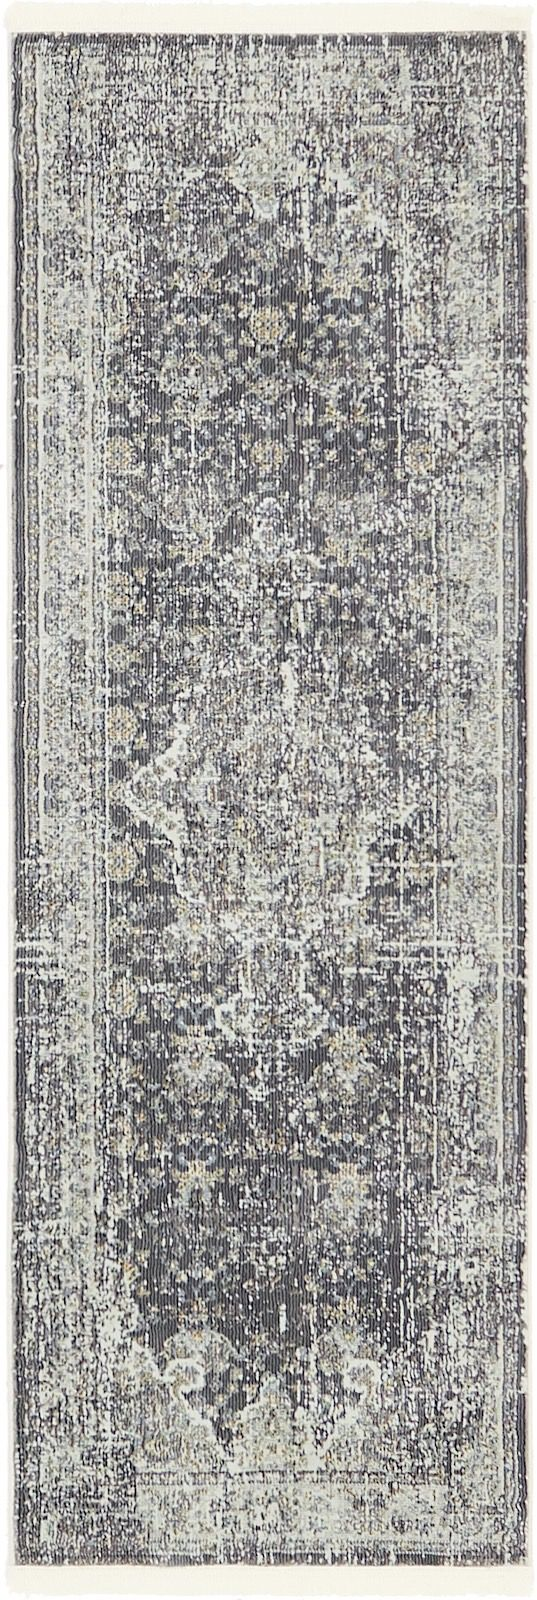 varadero traditional area rug collection